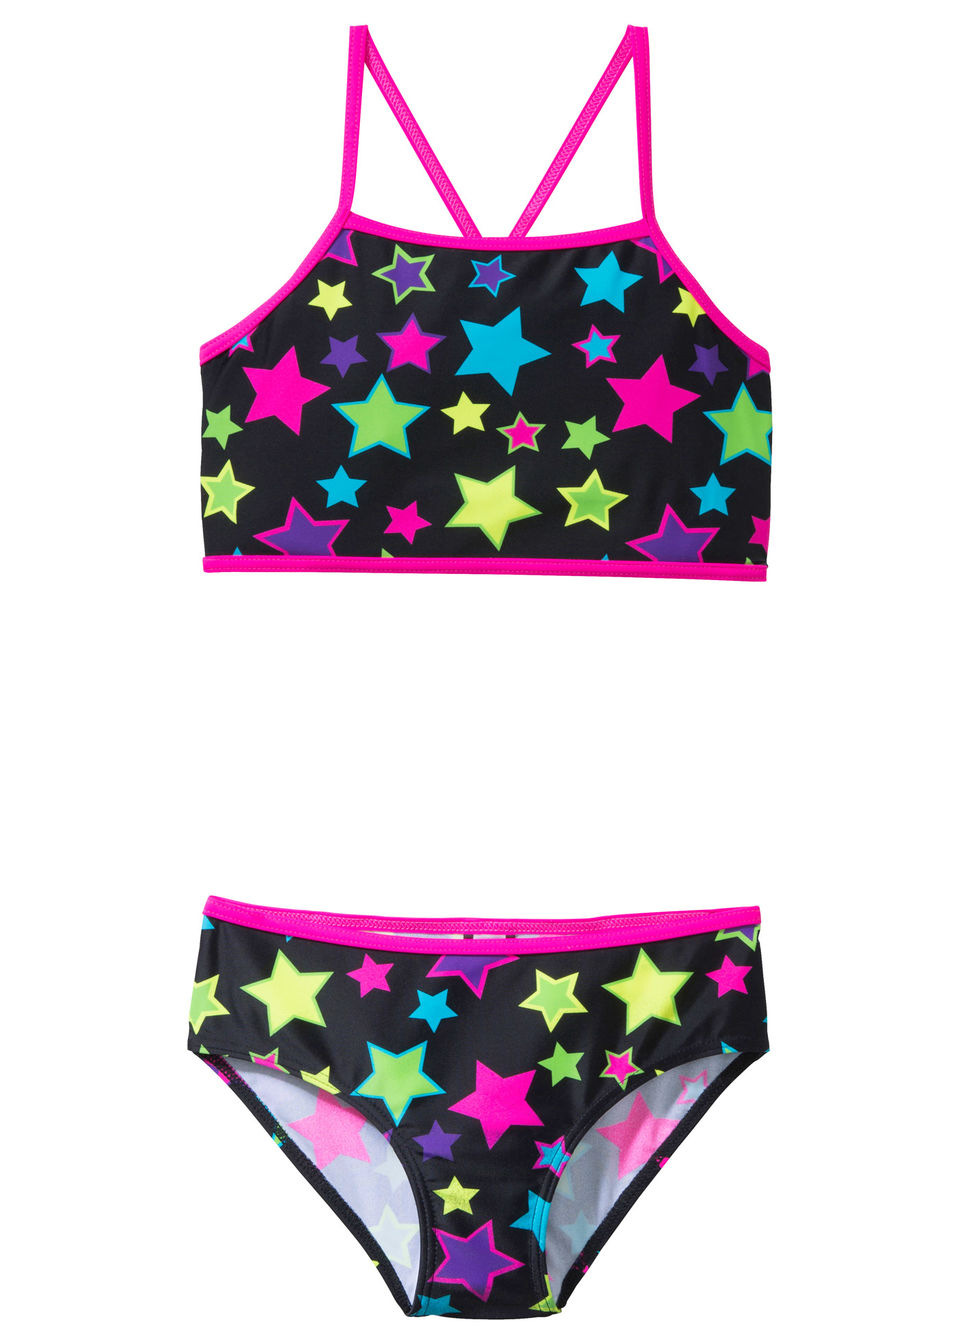 Costum de baie fetiţe (2piese/set) bonprix de la bpc bonprix collection